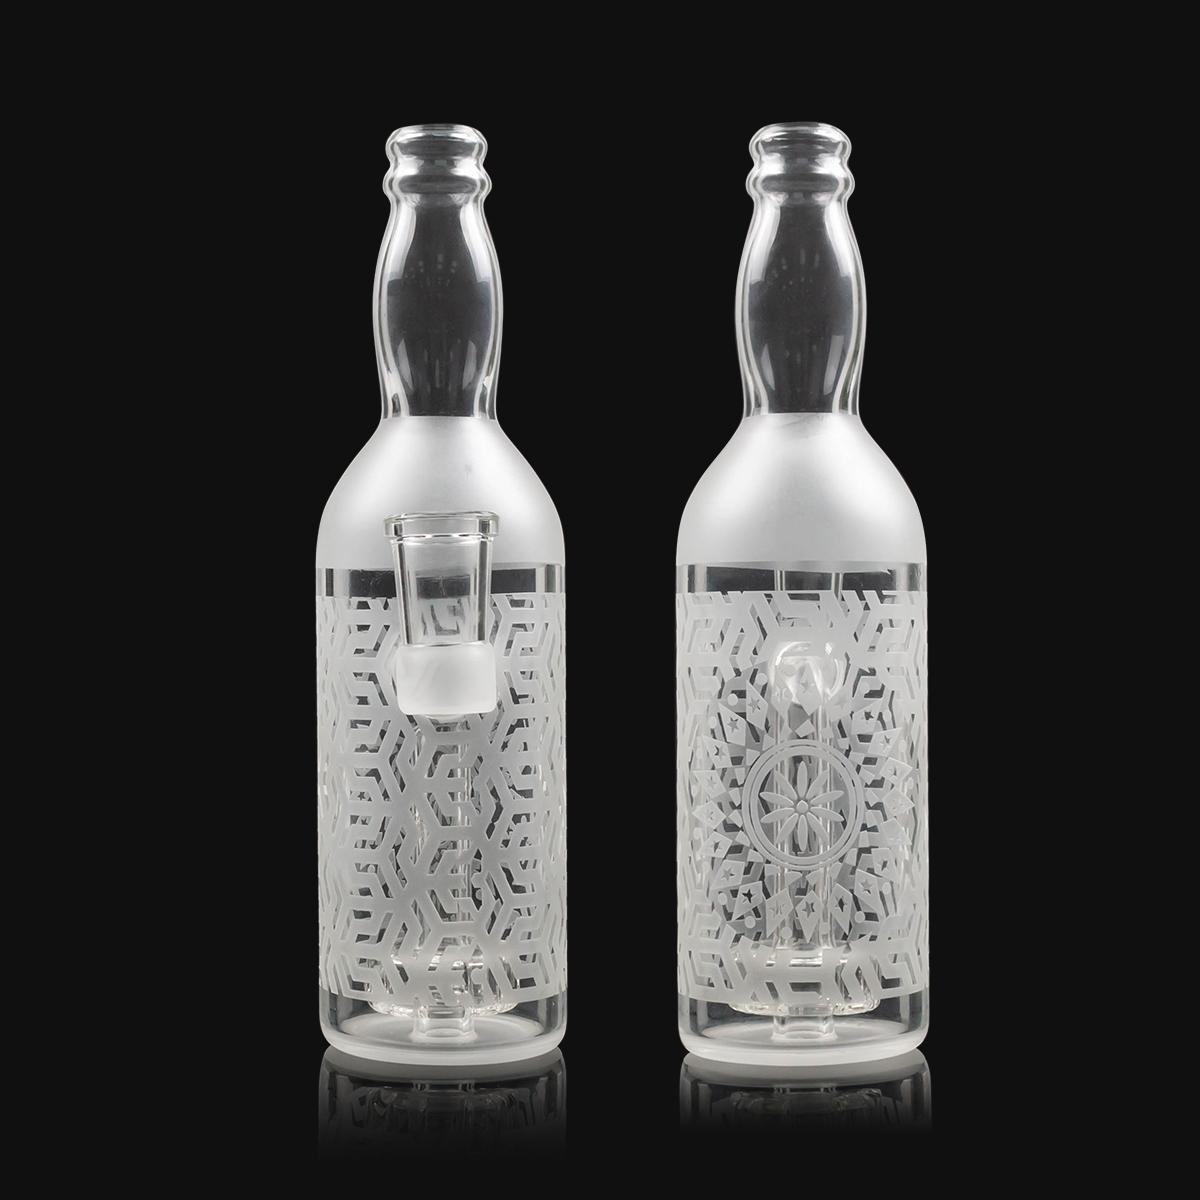 Más nuevo 7 pulgada de agua blanca burbujeador bong 14mm femenino femenino botella de vidrio BONG DAB Riga de vidrio Plataforma de aceite de bong con accesorios para fumar